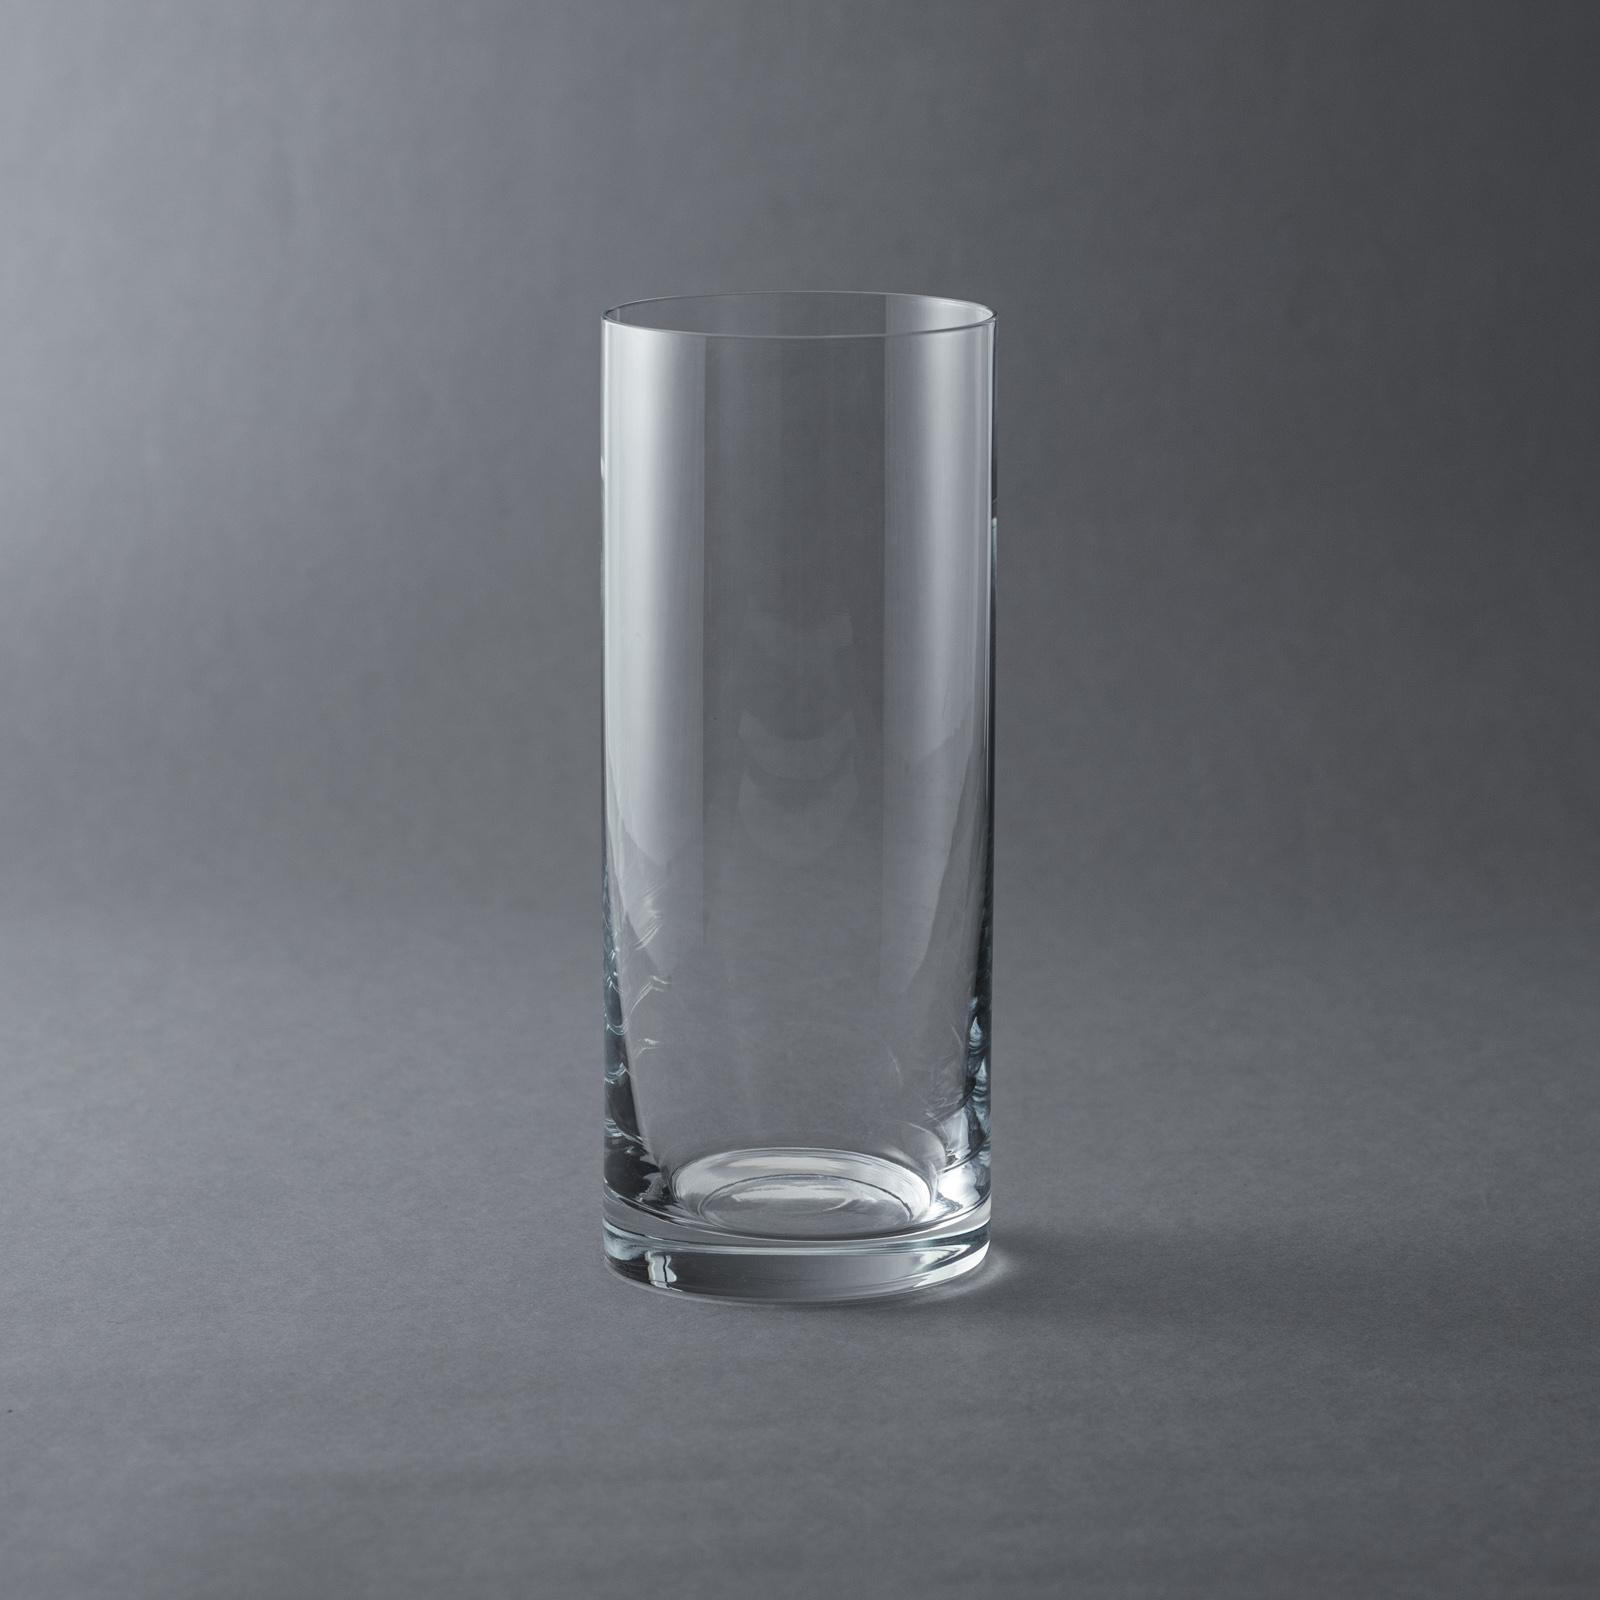 BOHEMIA Cristal _ フォーユアホーム / フラワーベース シリンダー